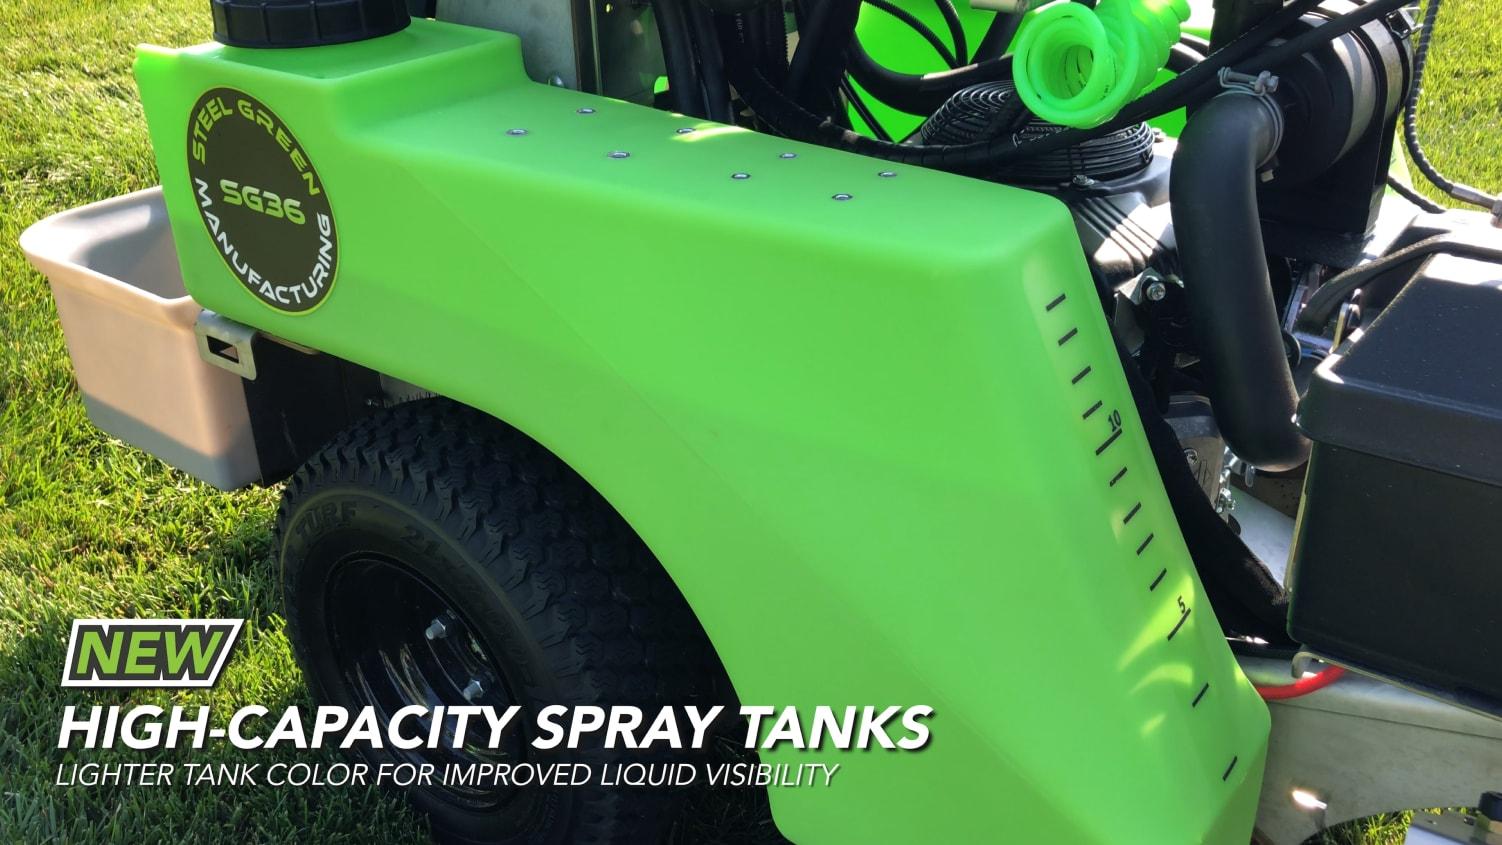 spray tanks on steel green equipment